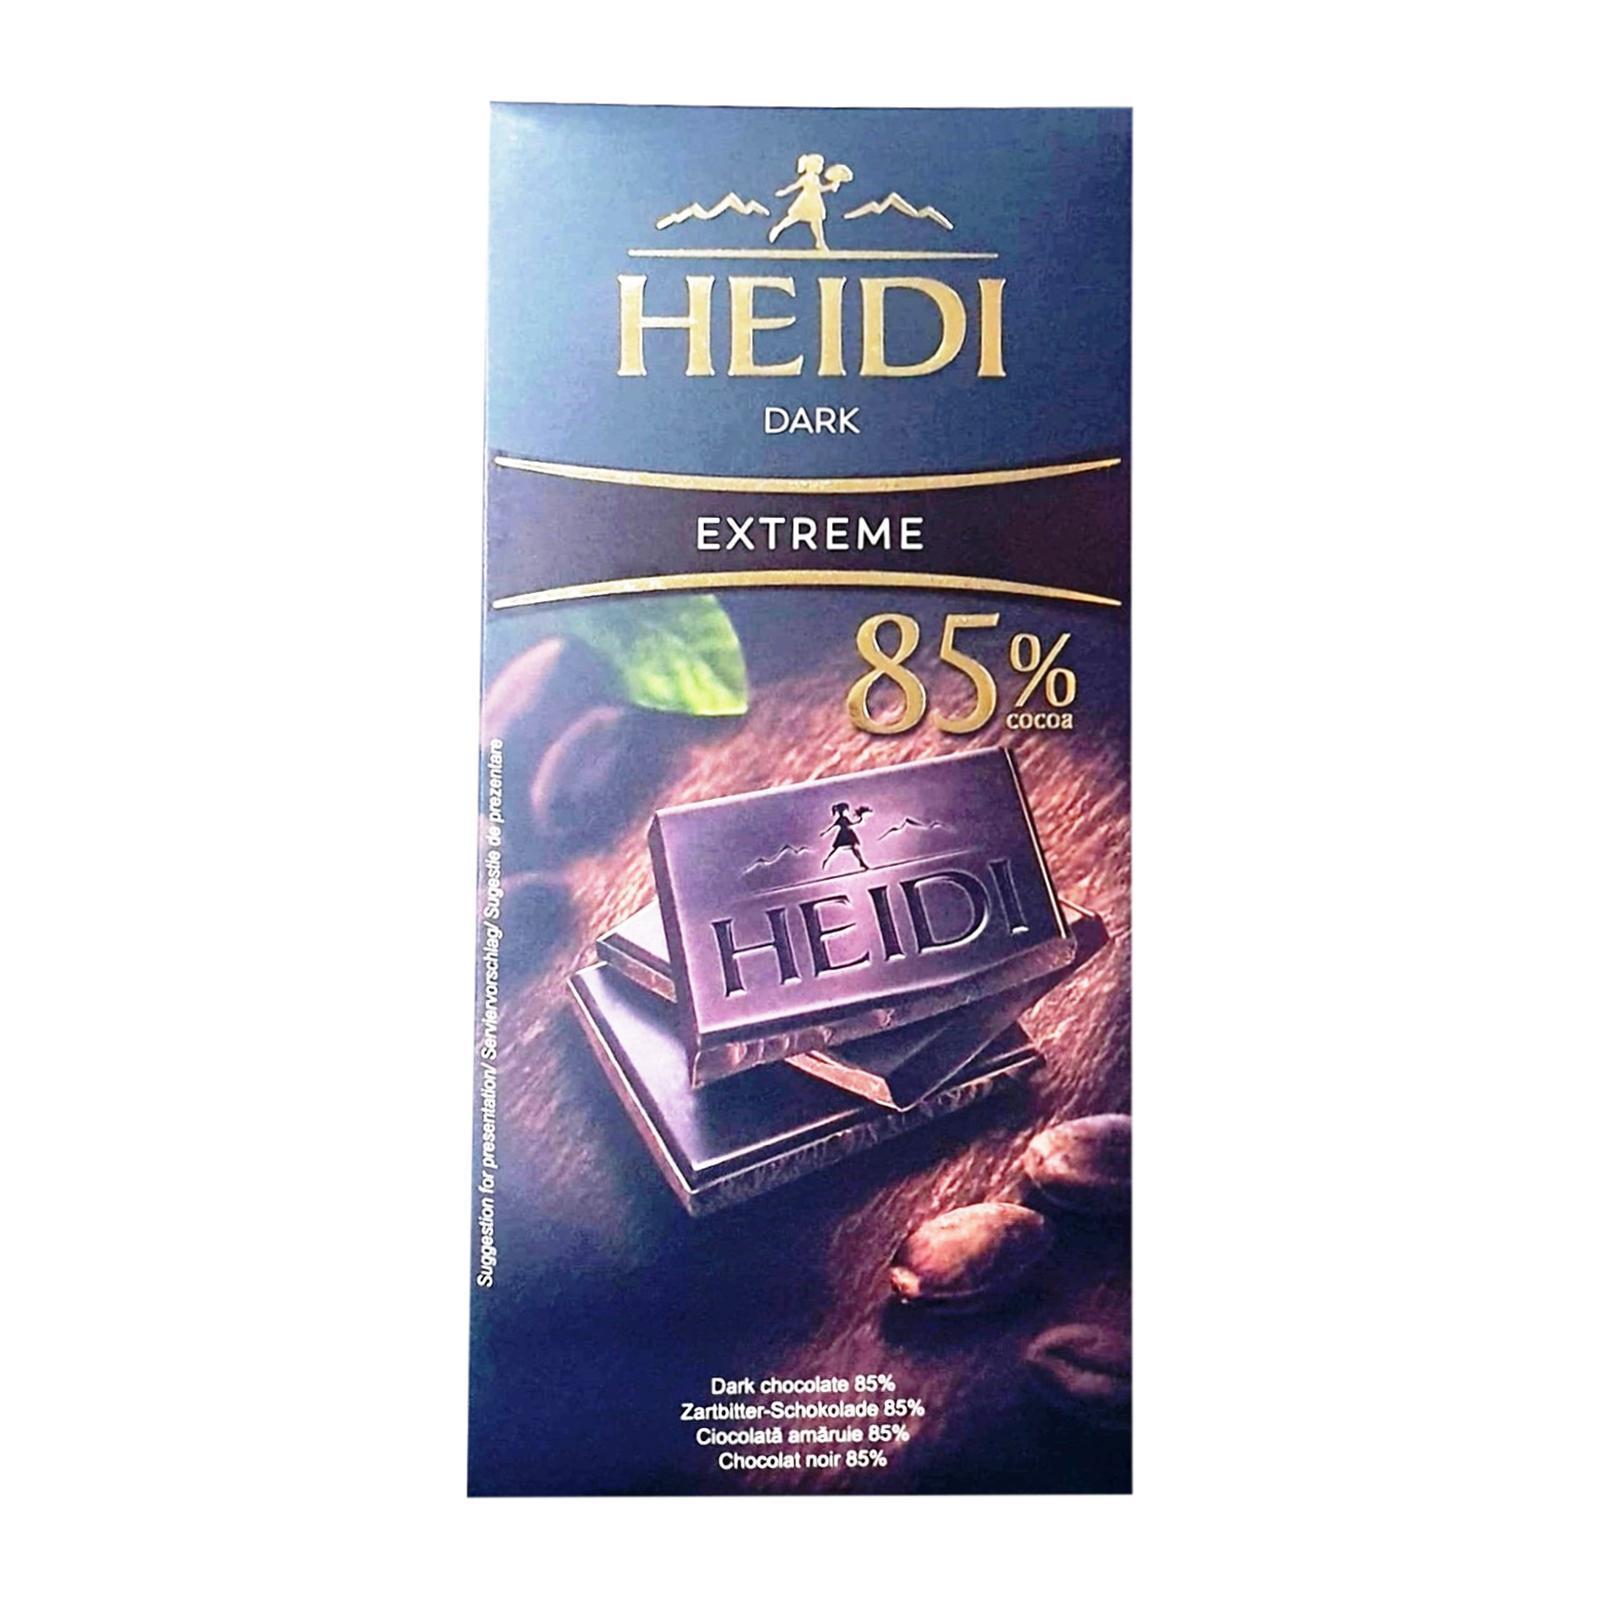 Heidi Dark Extreme Chocolate Bar - 85% Cocoa